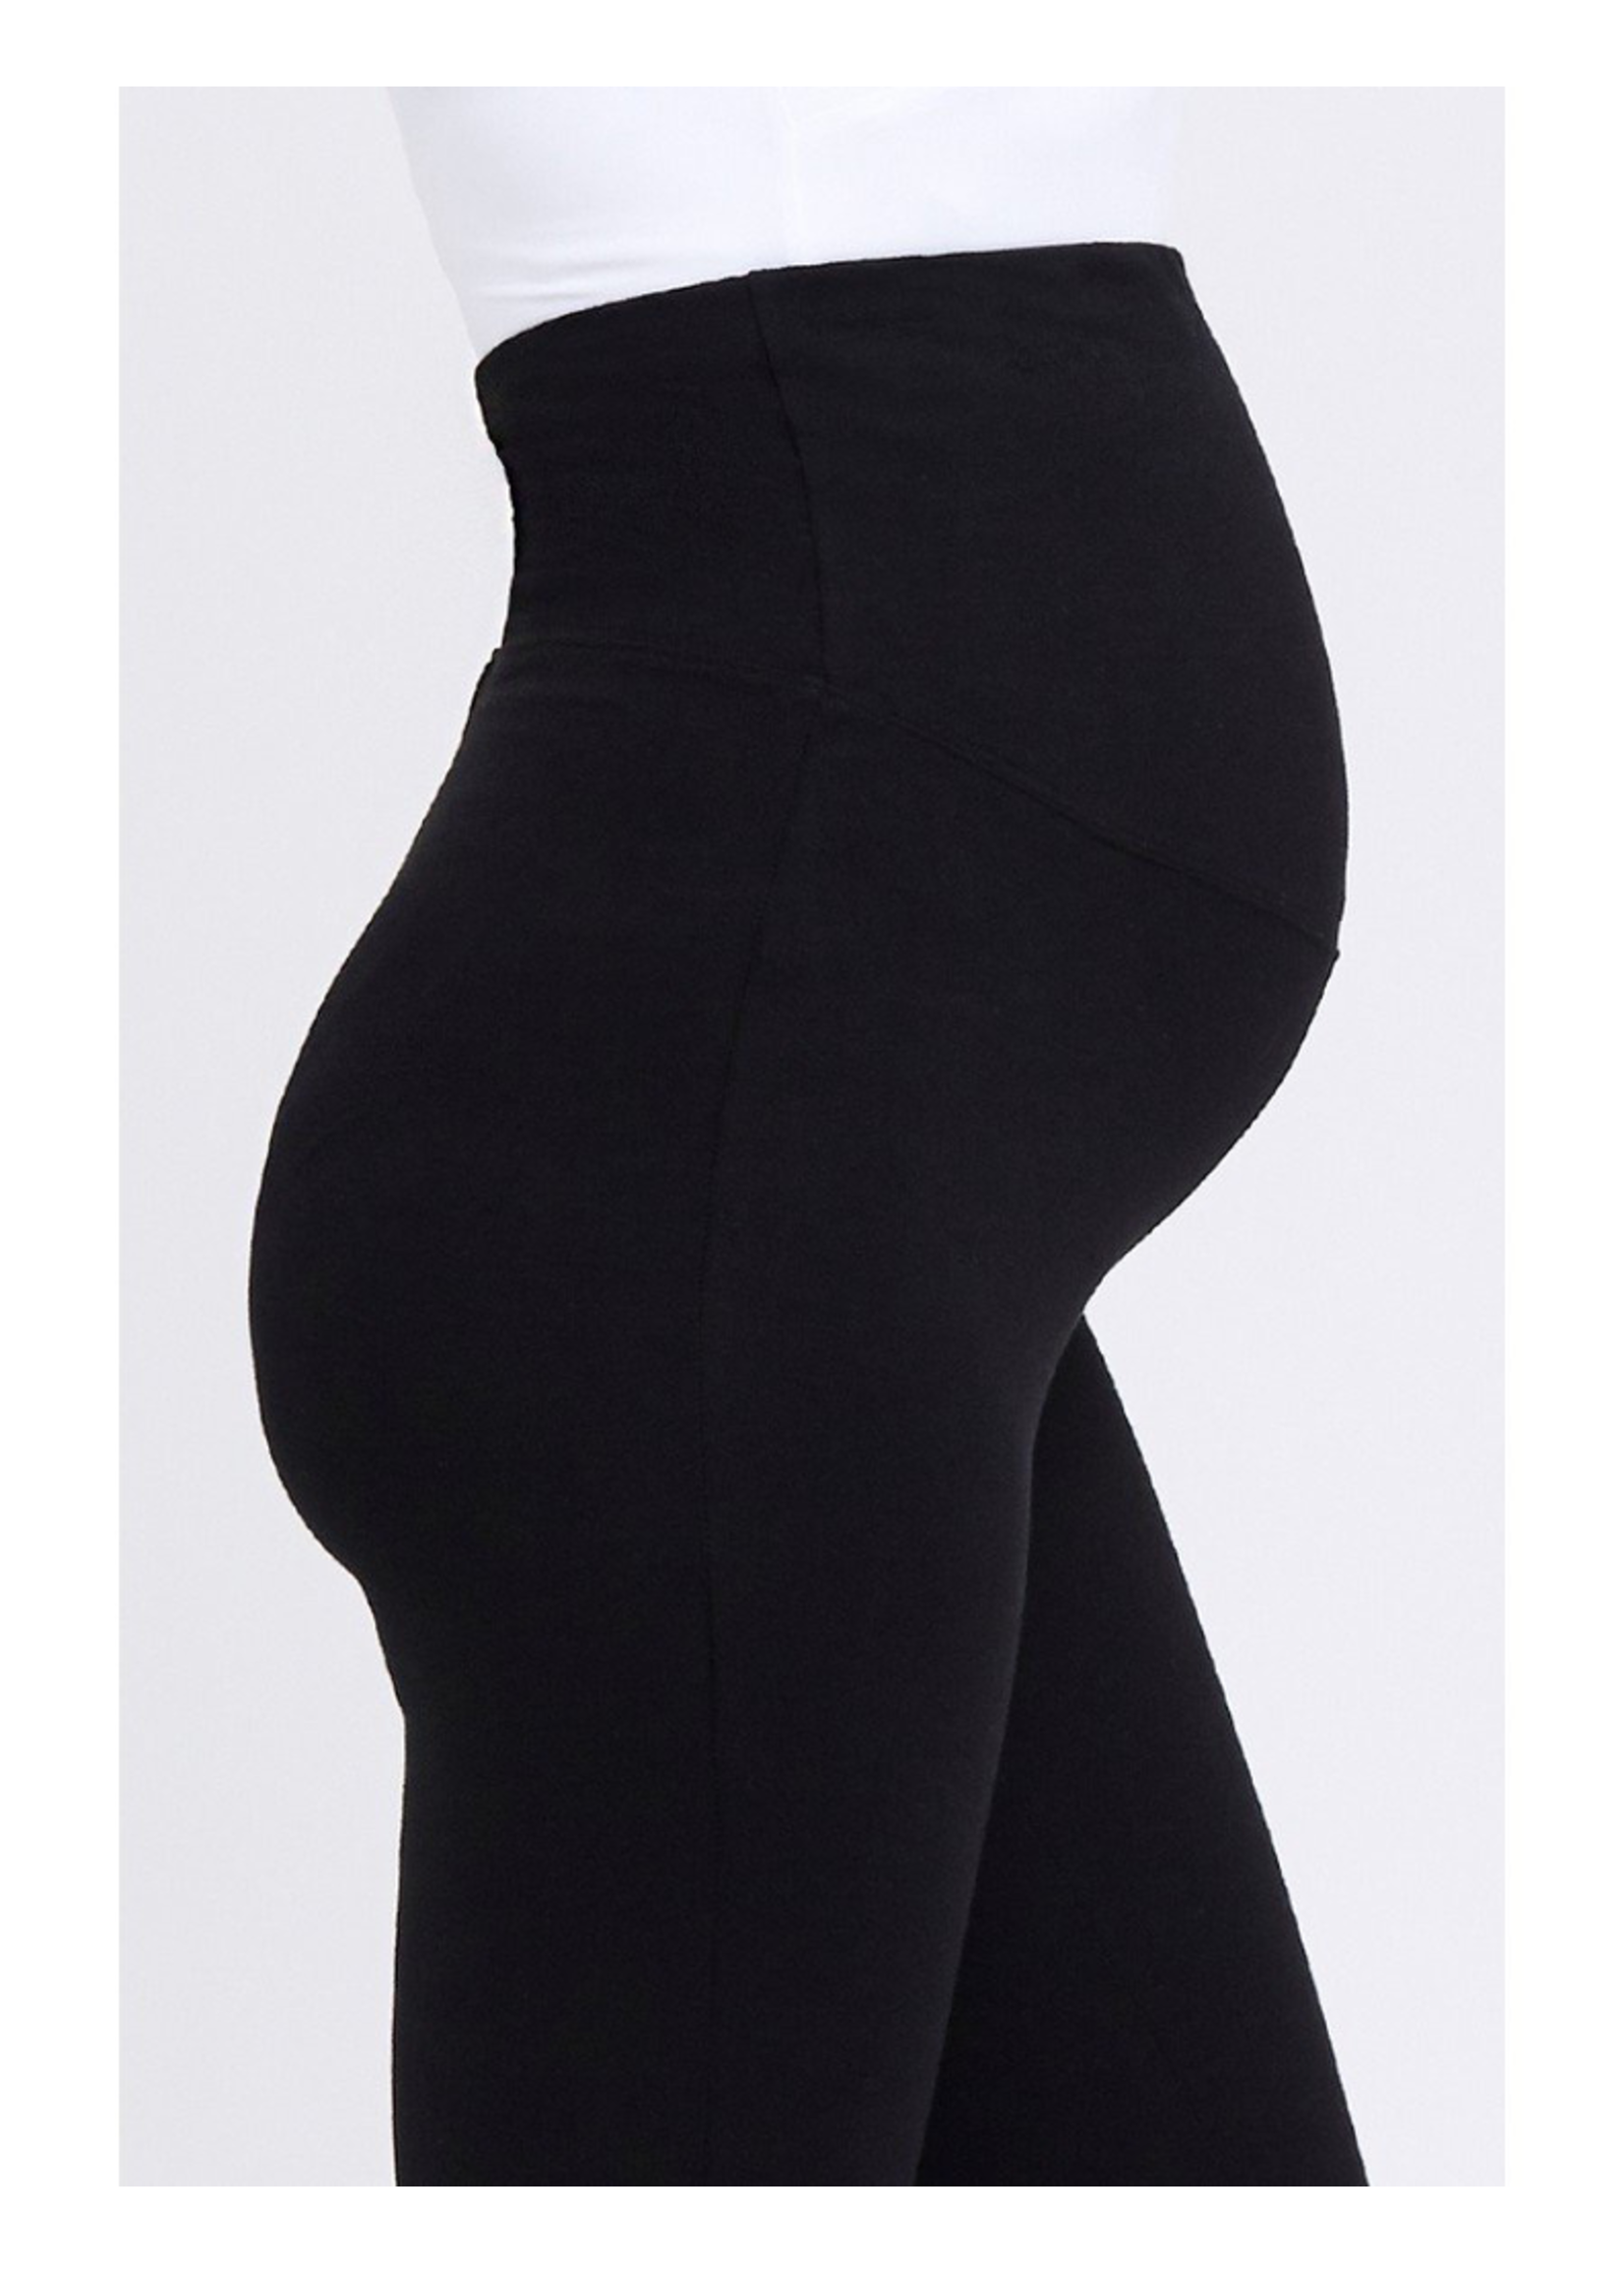 Ripe Maternity RIpe Maternity, Organic Over Tummy Maternity Legging in Black